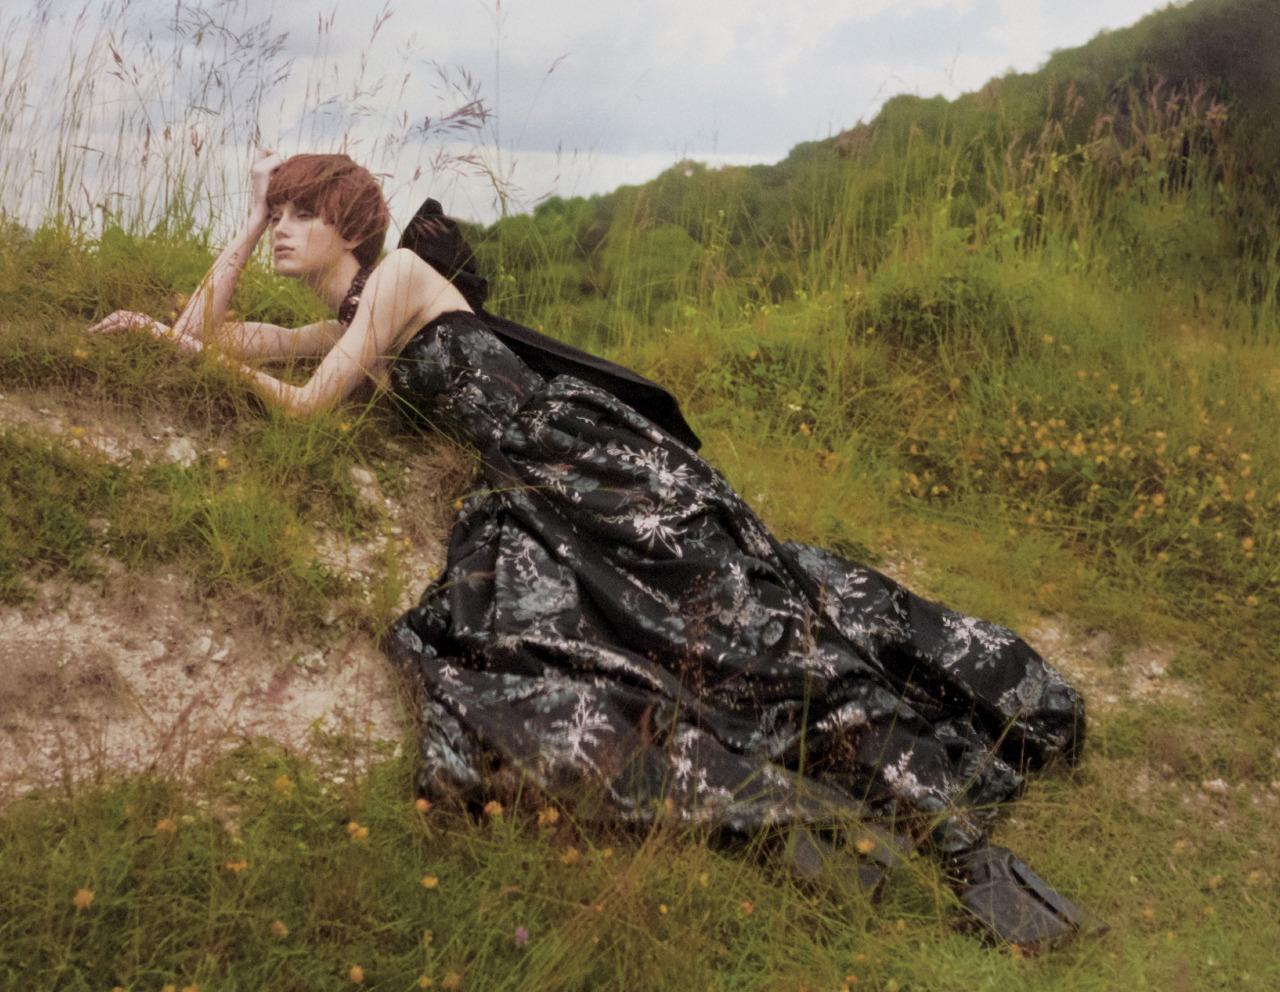 cd48fbde97a8 EDITORIAL Vogue US September 2016